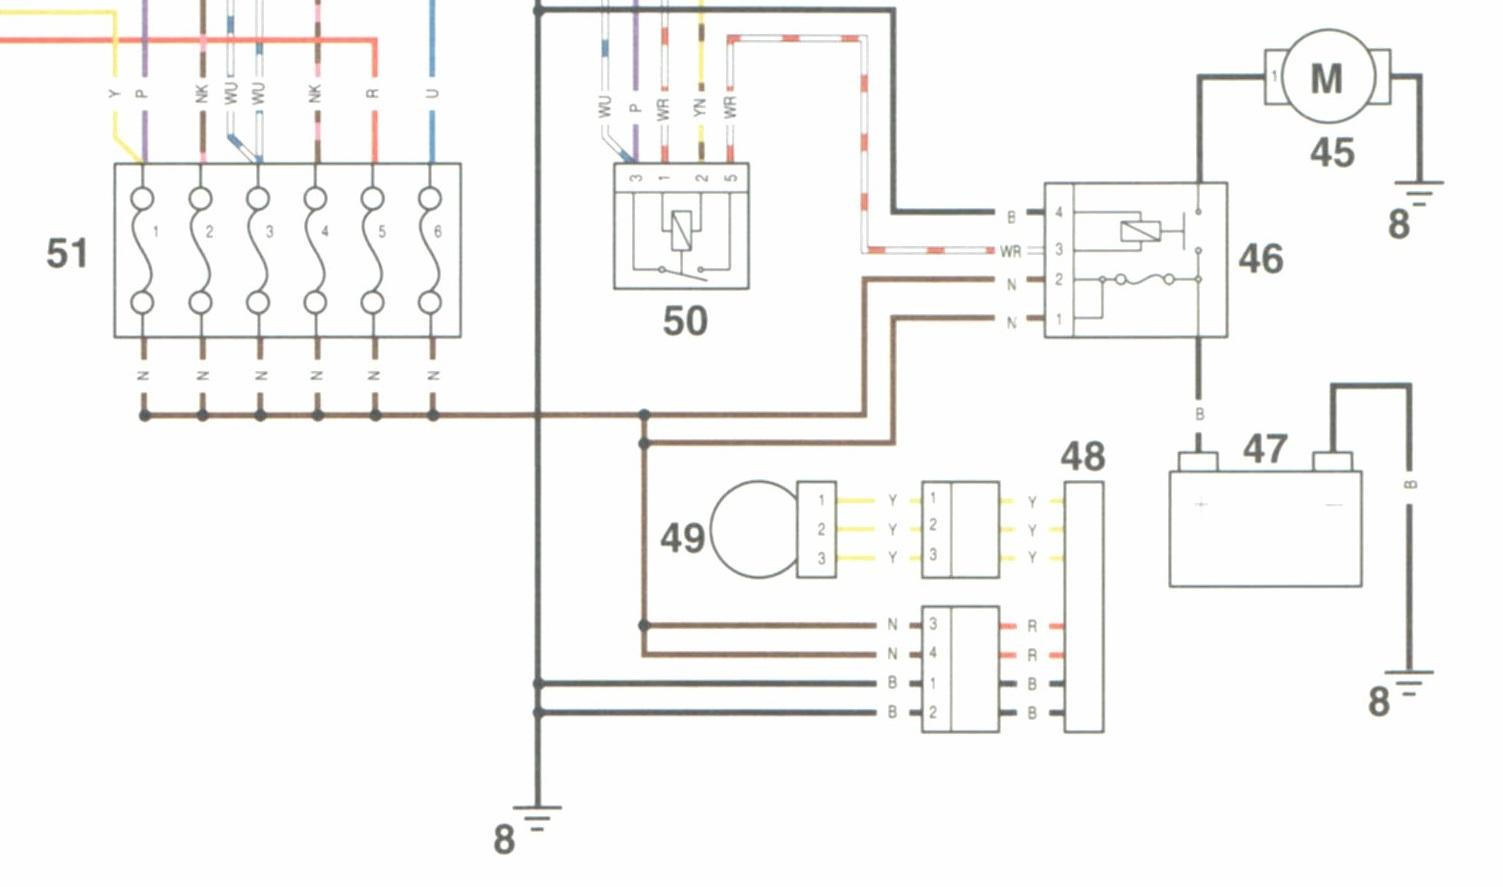 triumph daytona 675 wiring diagram husqvarna lawn mower parts 3 12 kenmo lp de a relocated r direct to battery 2013 675r triumph675 net rh 2009 speed triple